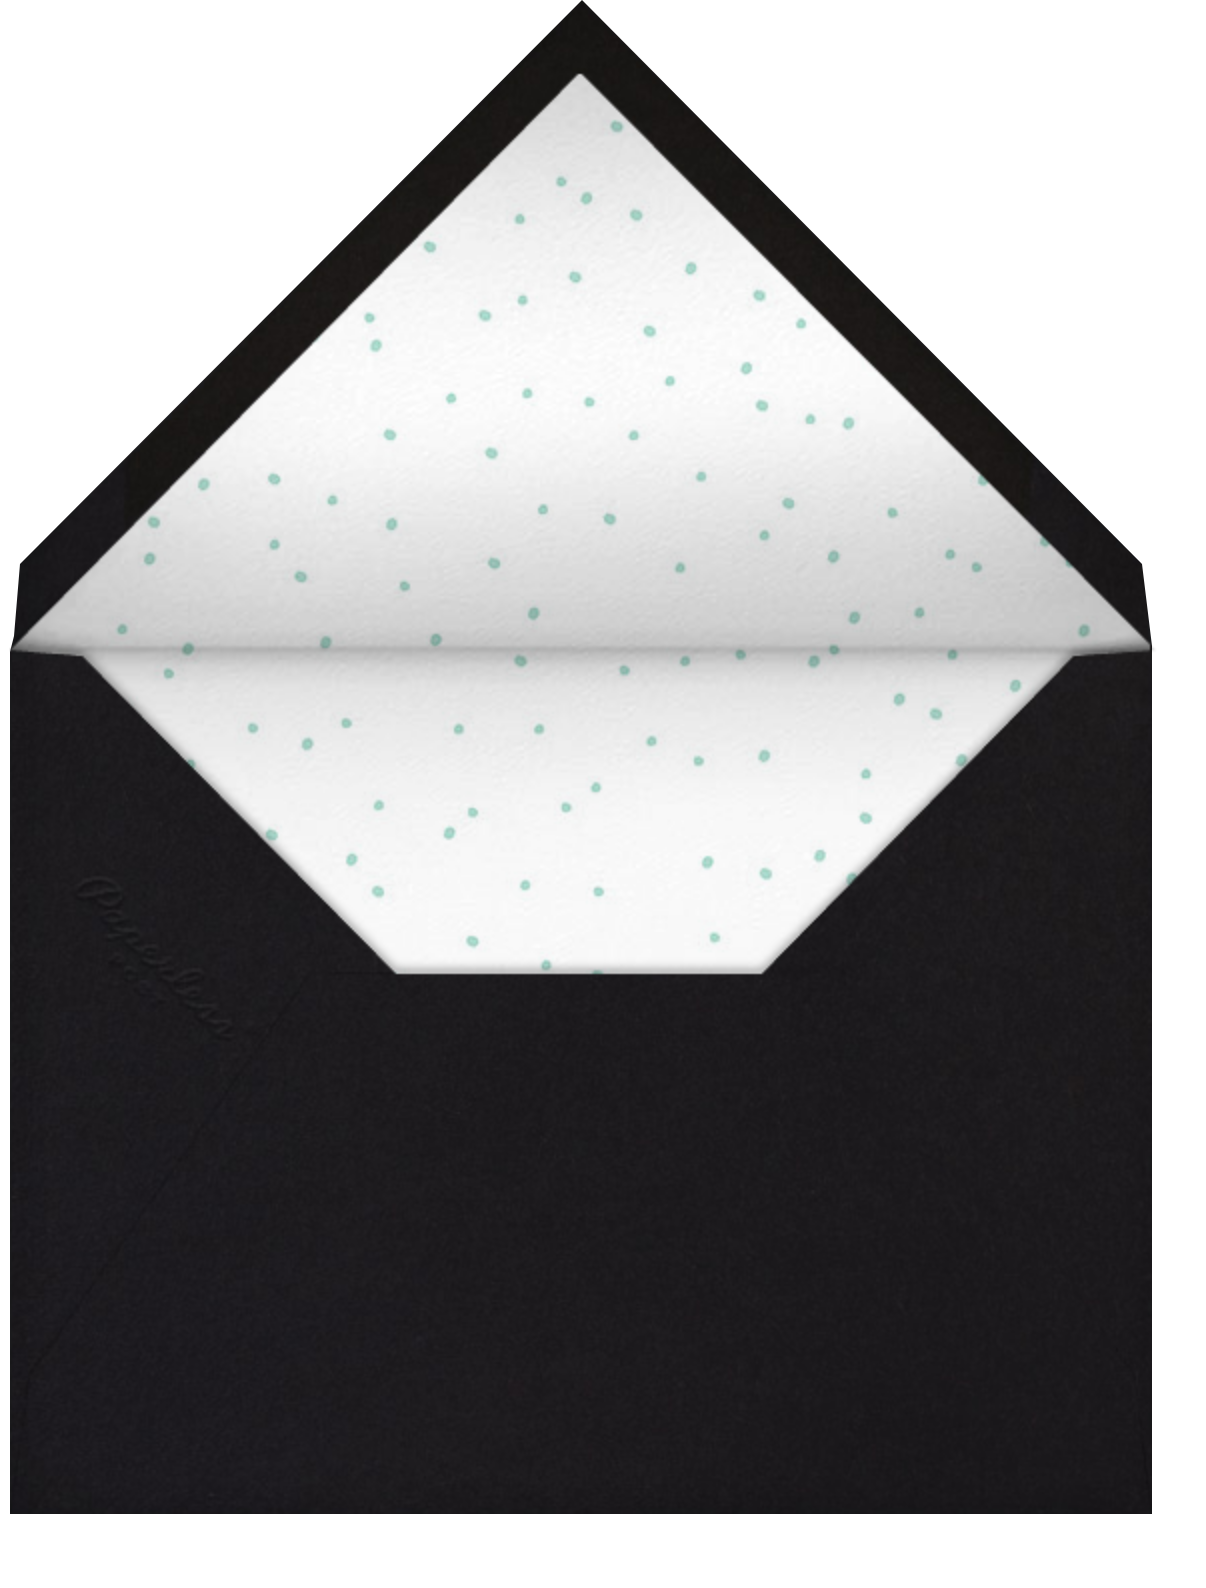 Sonoma (Invitation) - Black - Linda and Harriett - All - envelope back